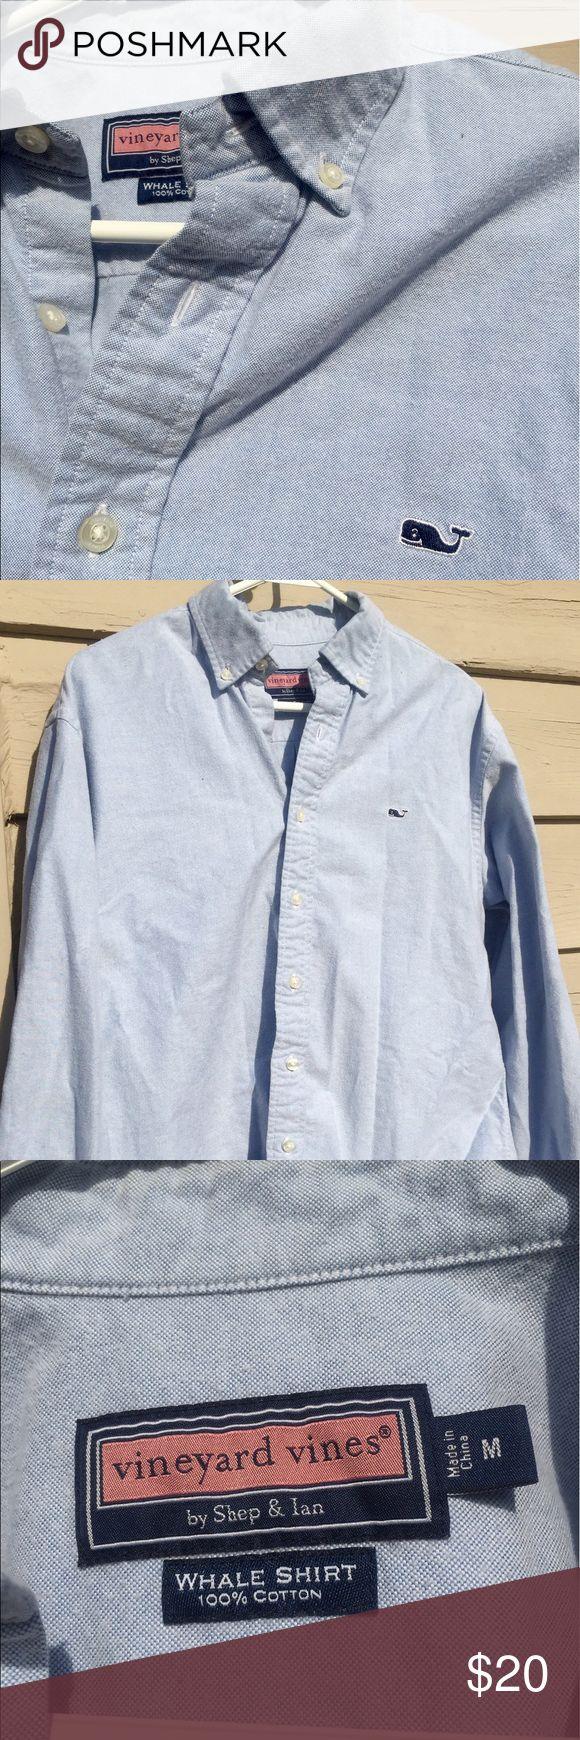 Men's Vineyard Vines Blue Button Down Men's Vineyard Vine light blue button down. Size medium. 100% cotton. ❤Love the shirt but not the price - make an offer! Vineyard Vines Shirts Casual Button Down Shirts